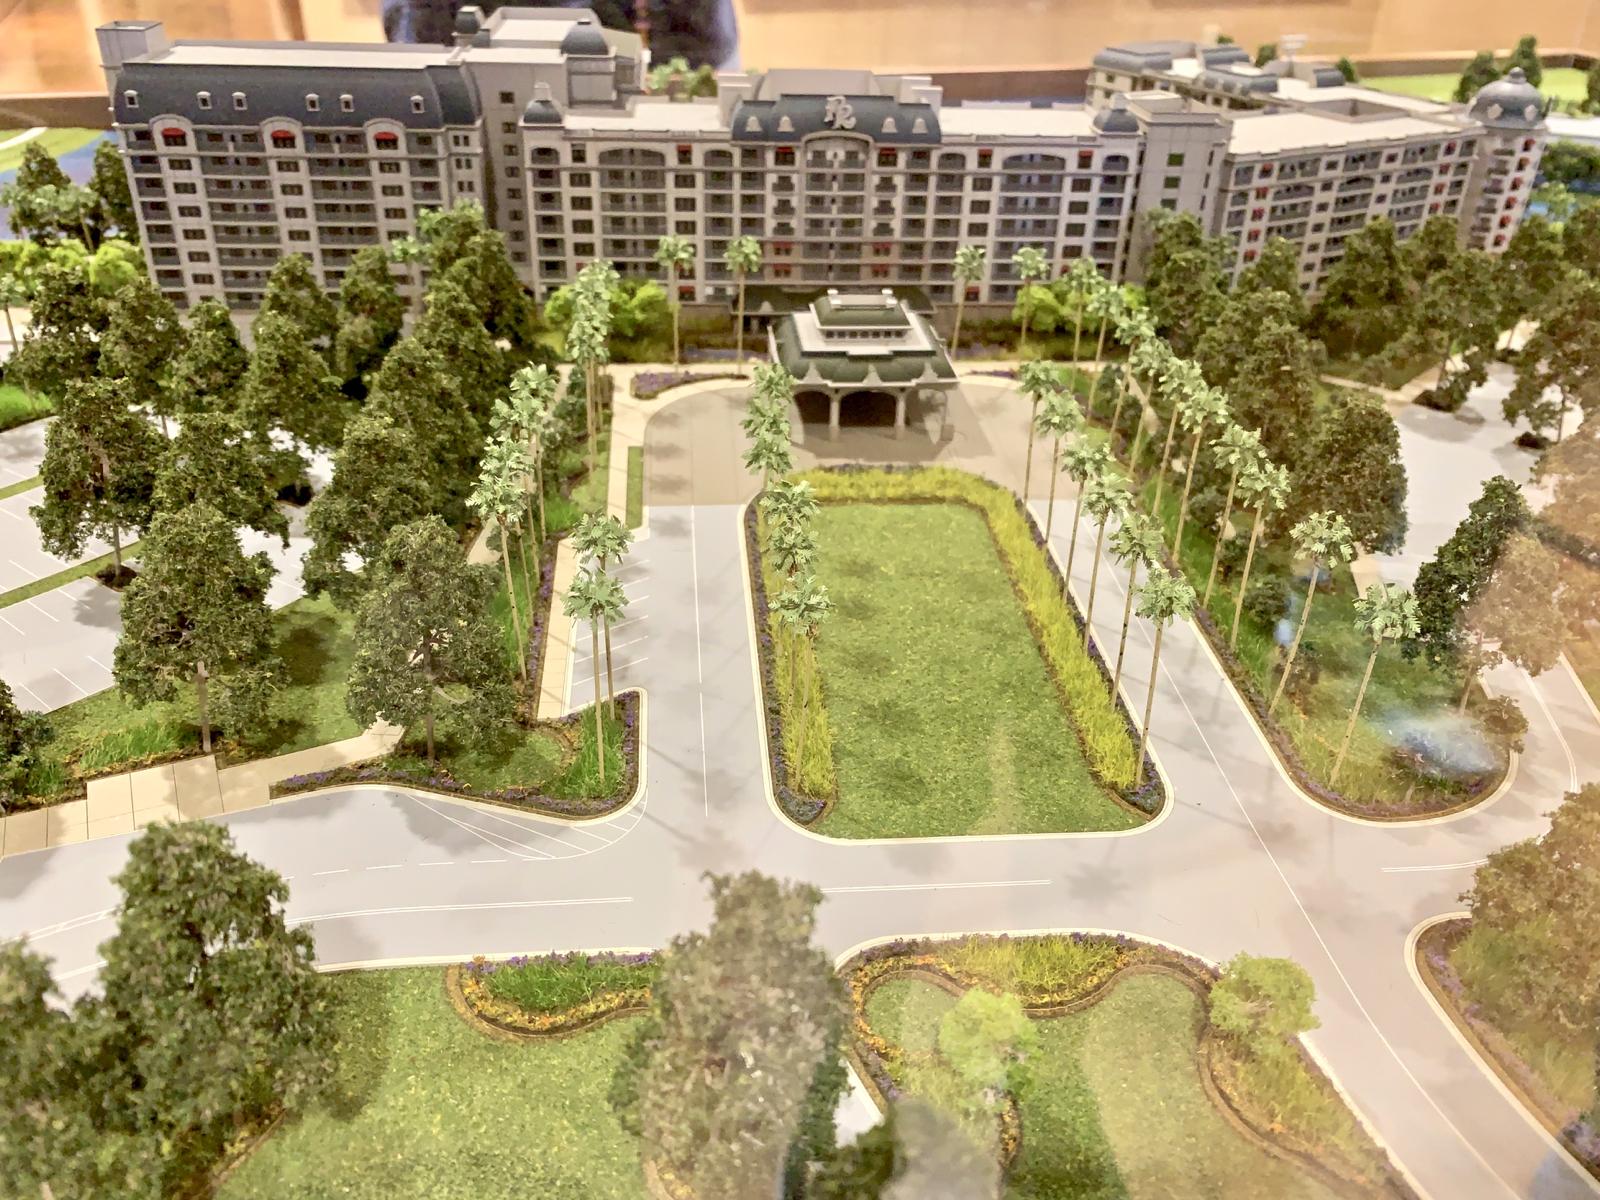 Dvc Summer 2020.Mouseplanet Walt Disney World Resort Update For October 1